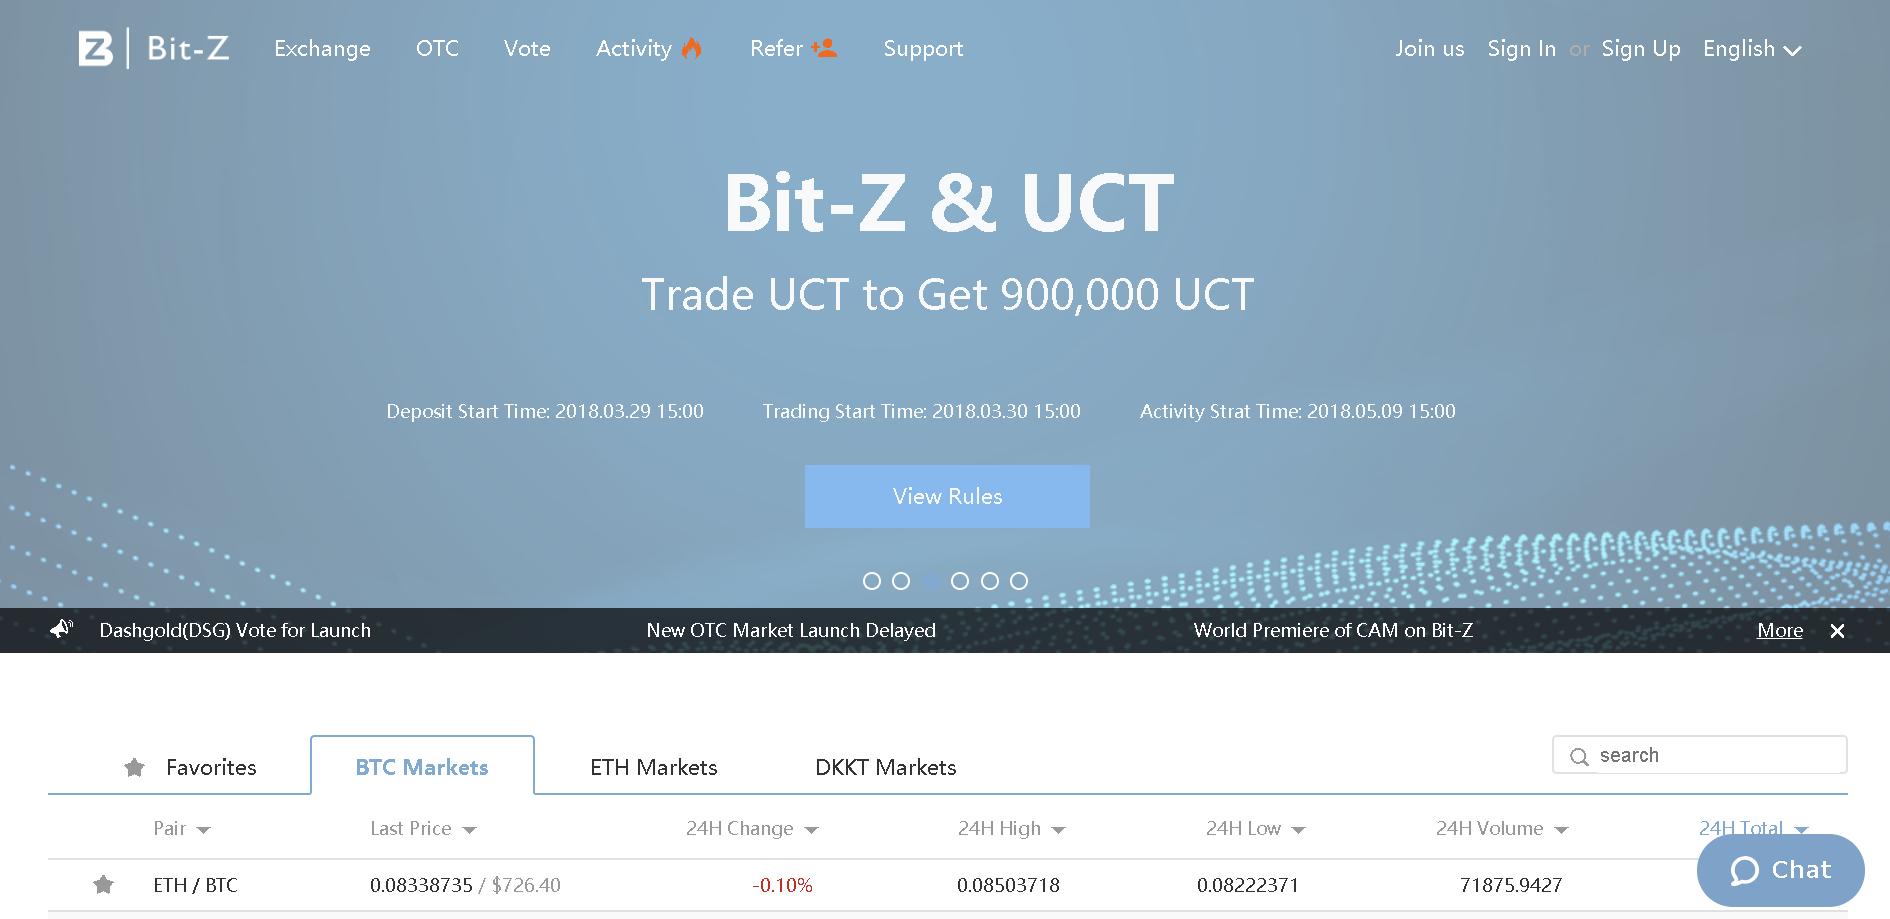 Bit-Z(ビットジー)の登録、口座解説方法、使い方を分かりやすく解説!